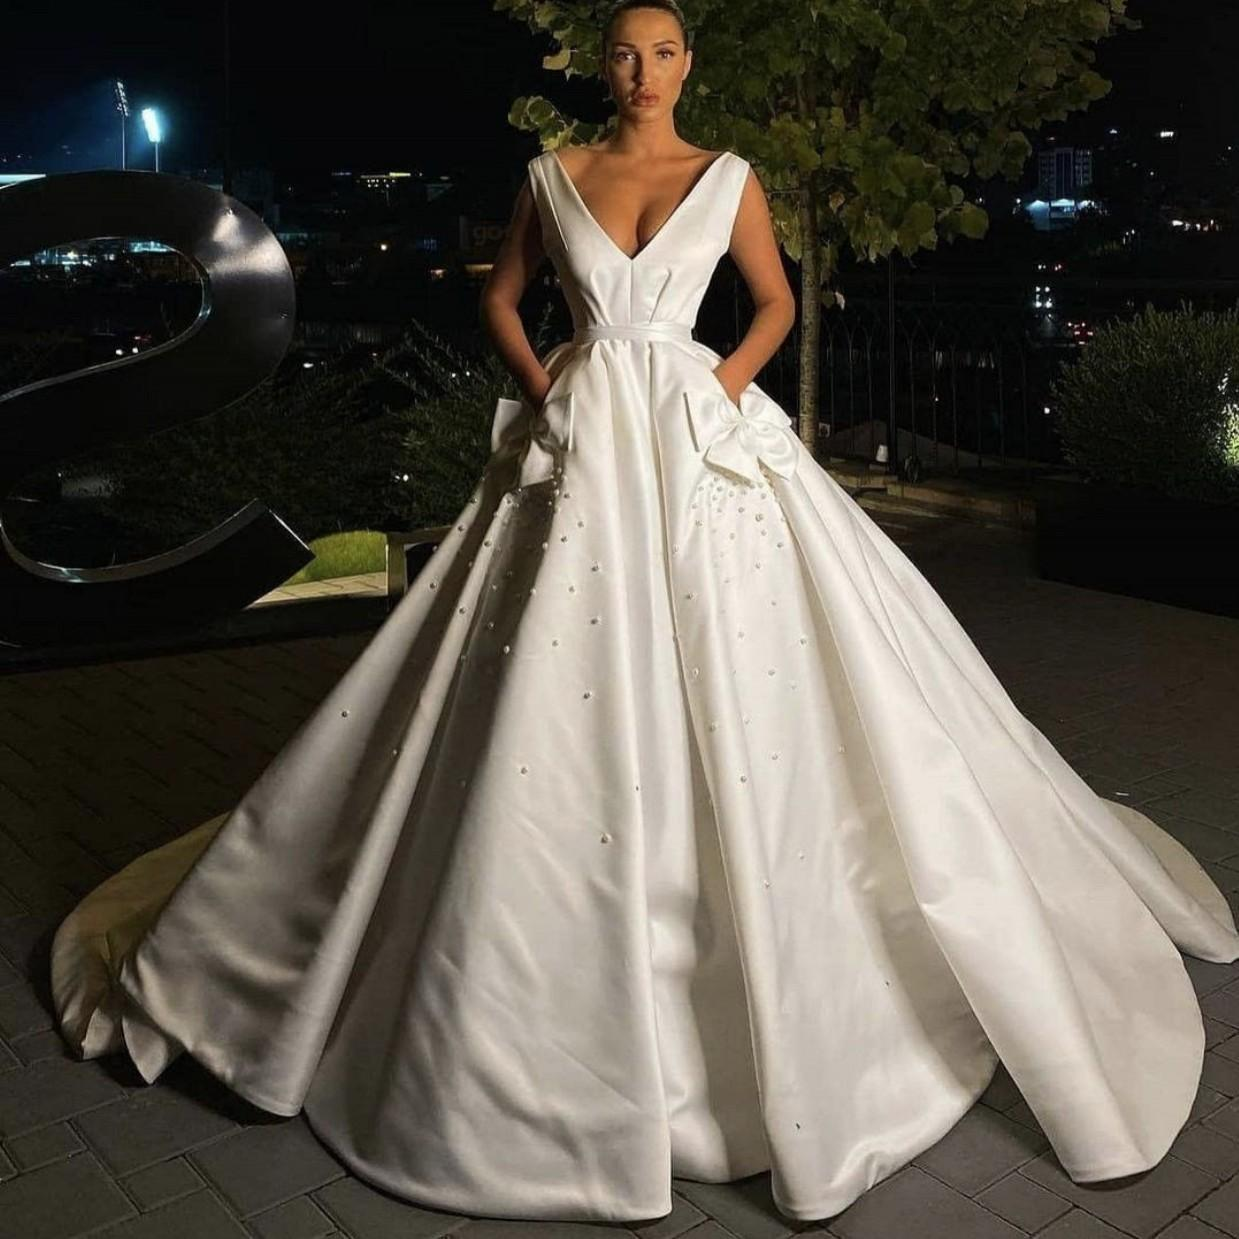 Barato Novo Elegante Novo Elegante Vestidos De Noiva De Noiva De Pérolas De Pérolas De Vara De Varredura De Cetim Backless Bolsos Vestidos Noiva Vestido De Noiva